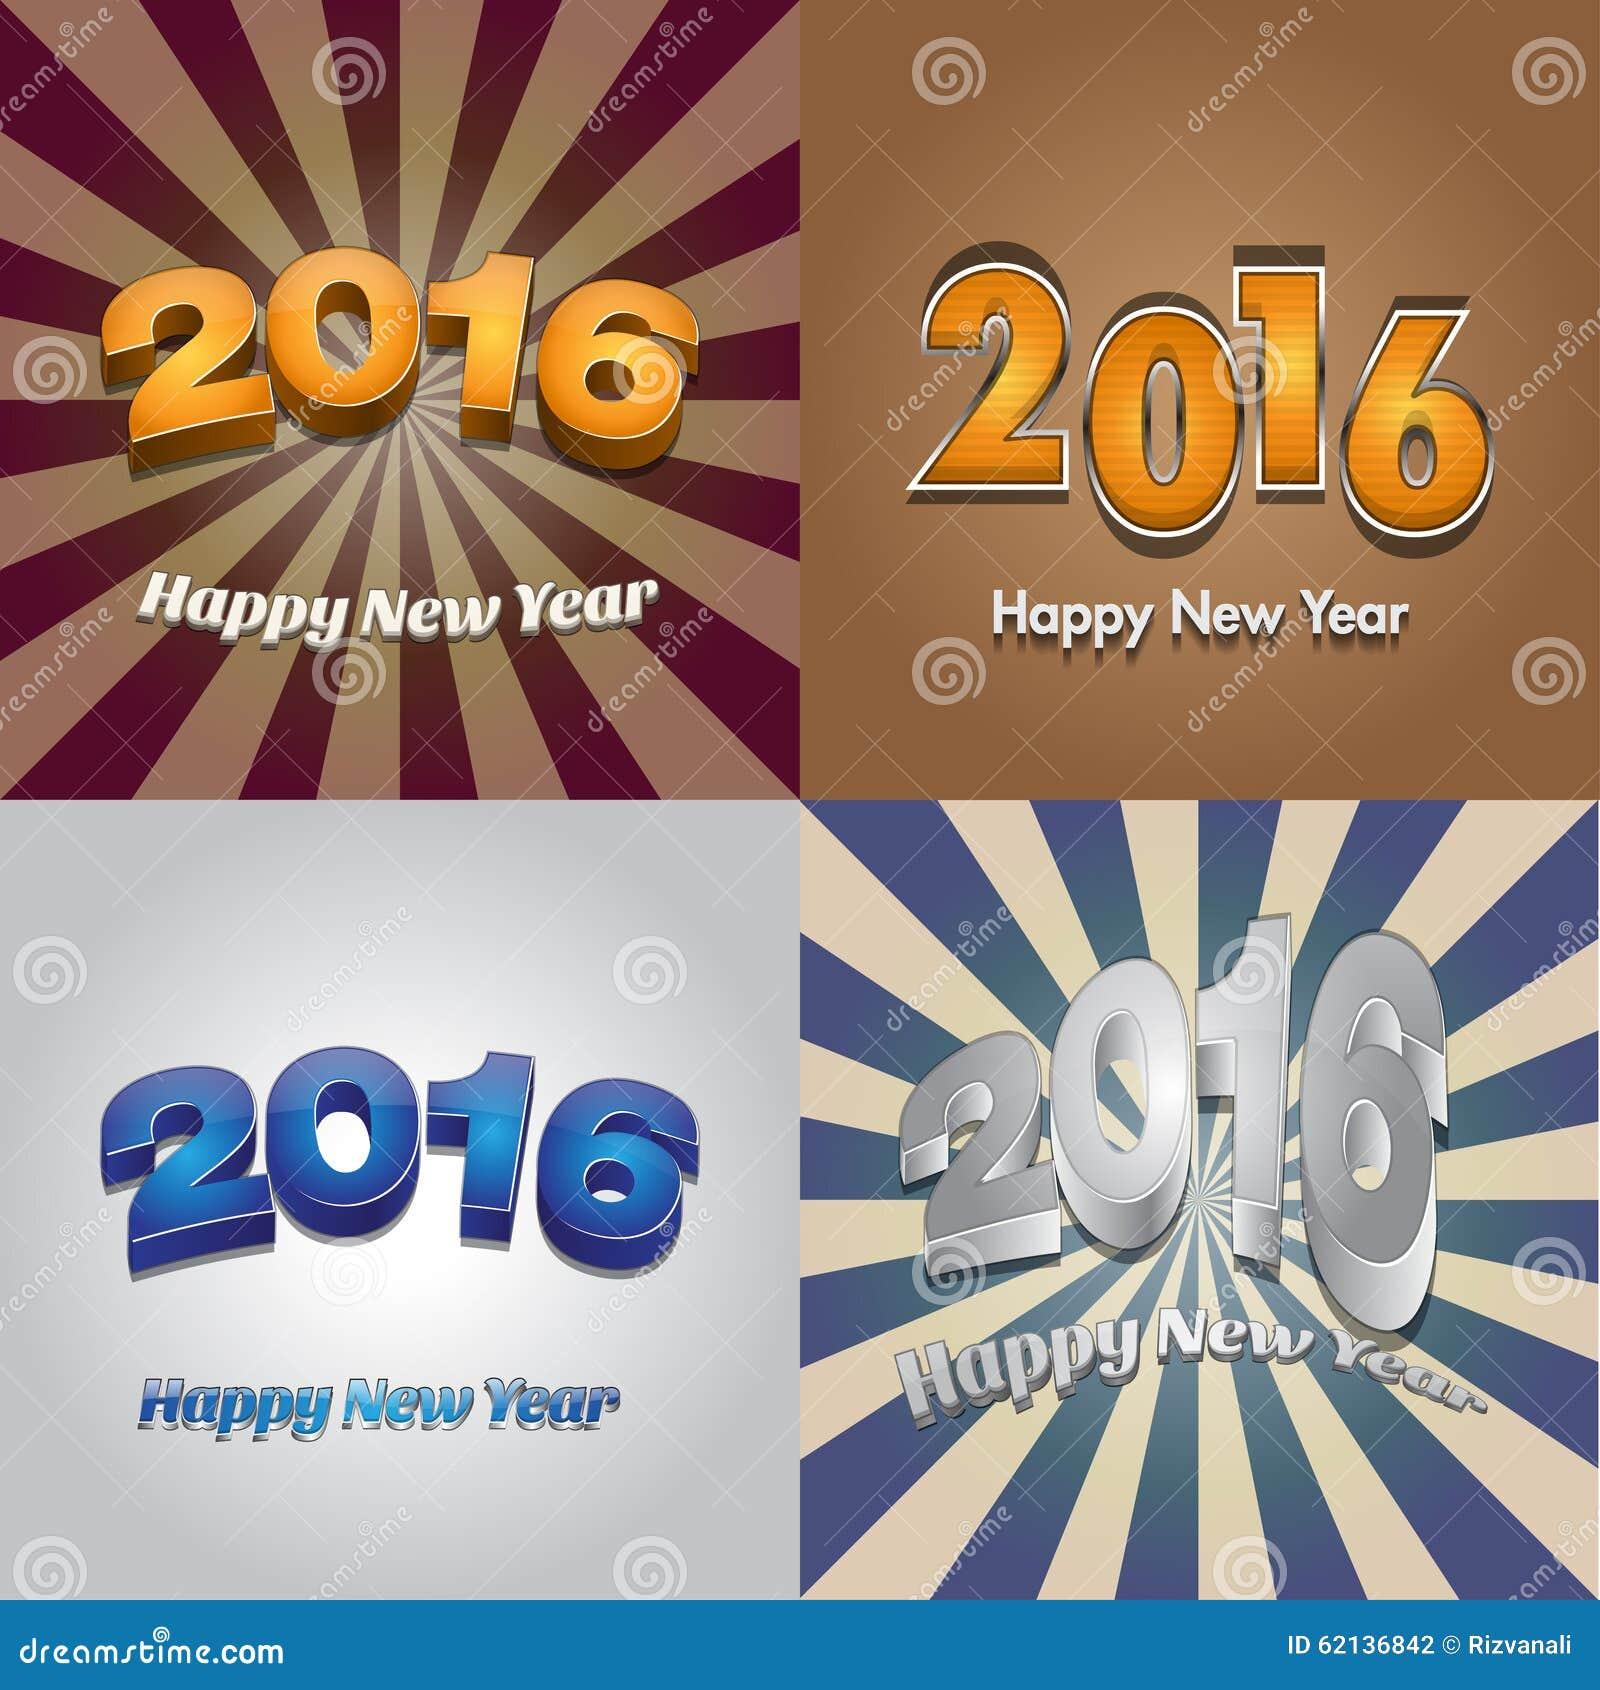 Happy new year 2016 wallpaper design stock vector image for New design wallpaper 2016